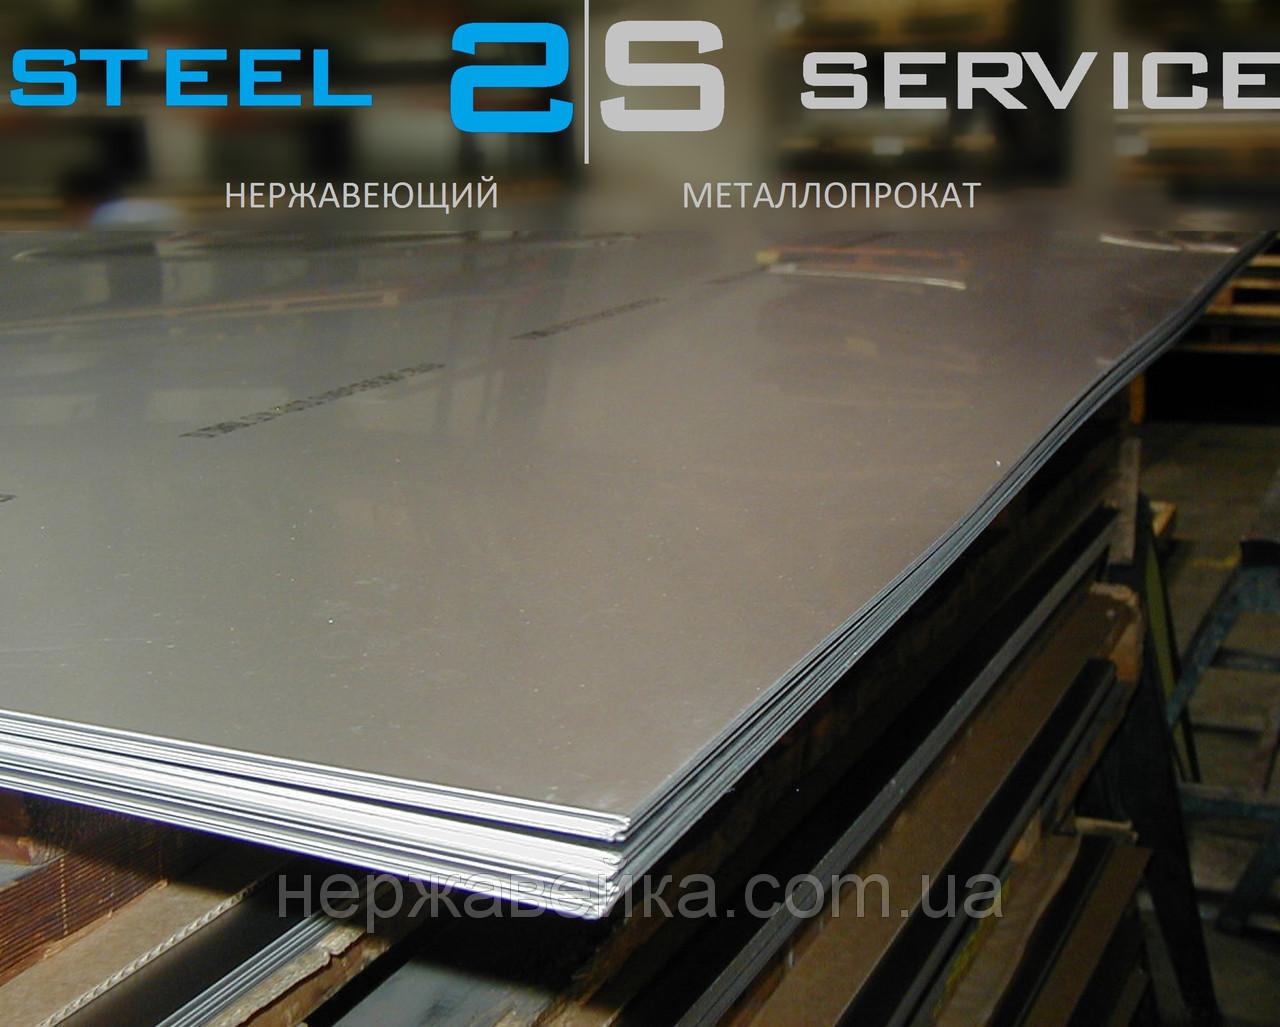 Нержавейка лист 1х1500х3000мм  AISI 316L(03Х17Н14М3) 2B - матовый,  кислотостойкий